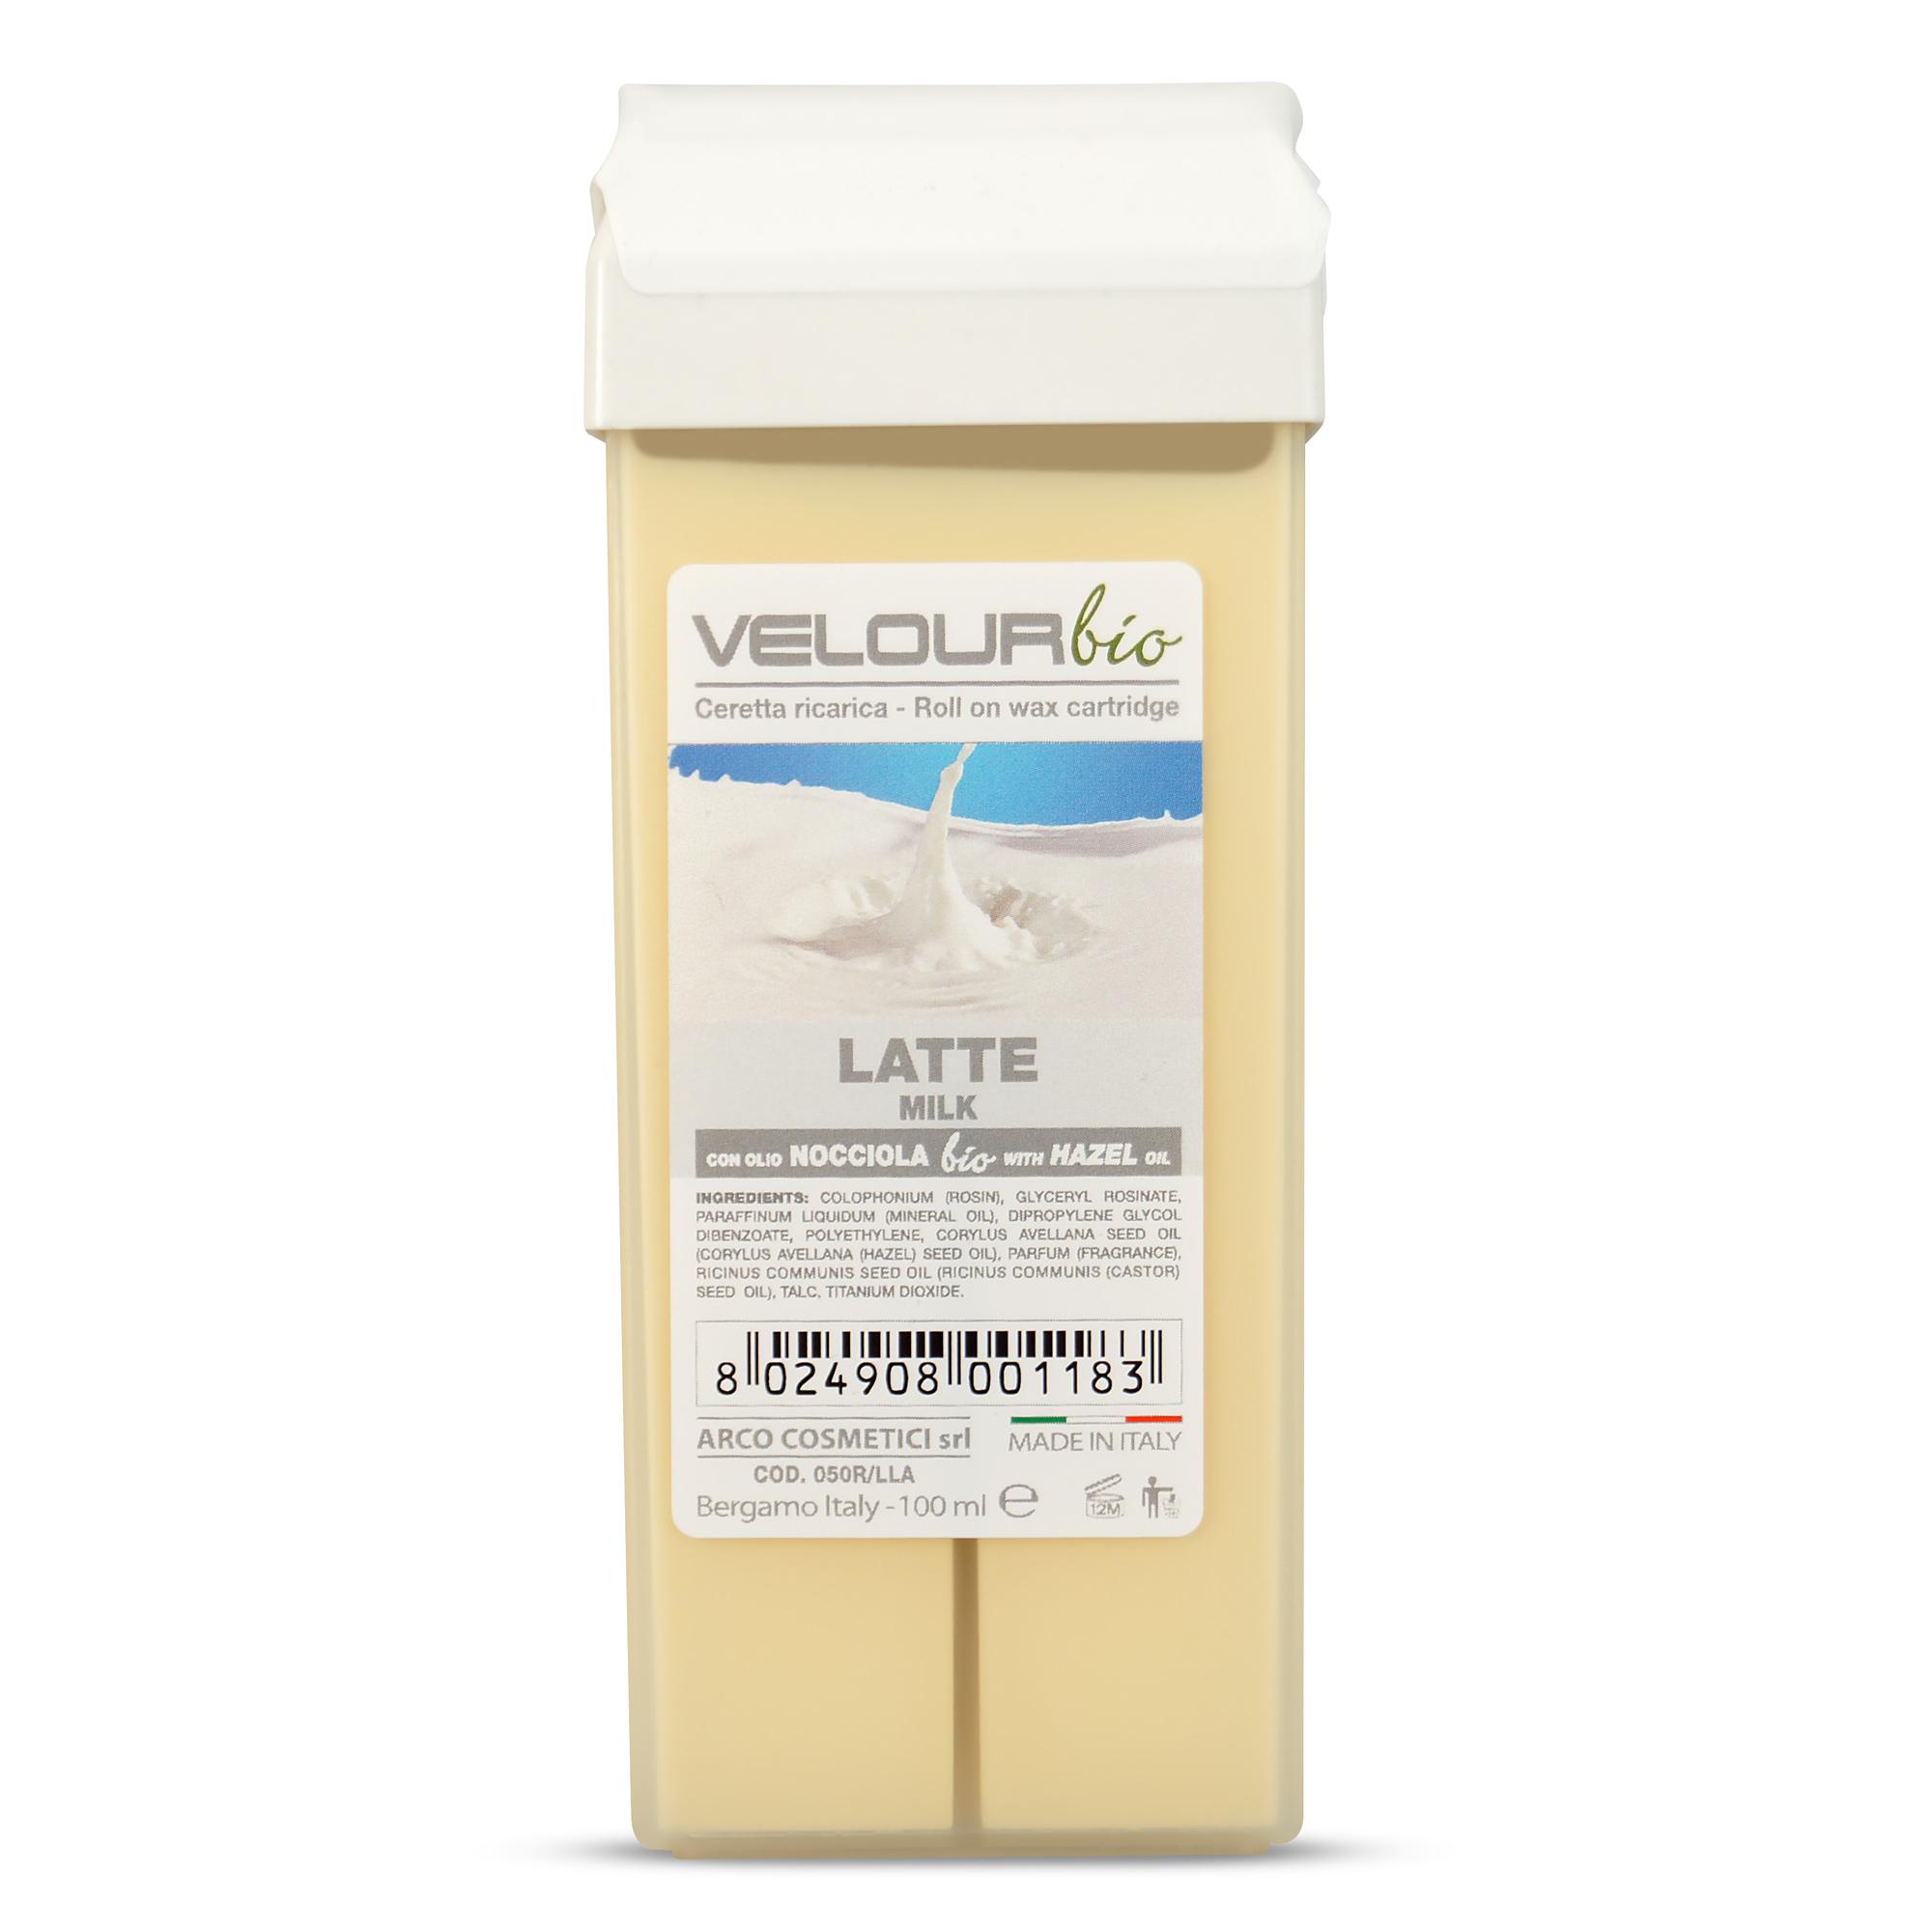 Image of Latte Milk, 100ml